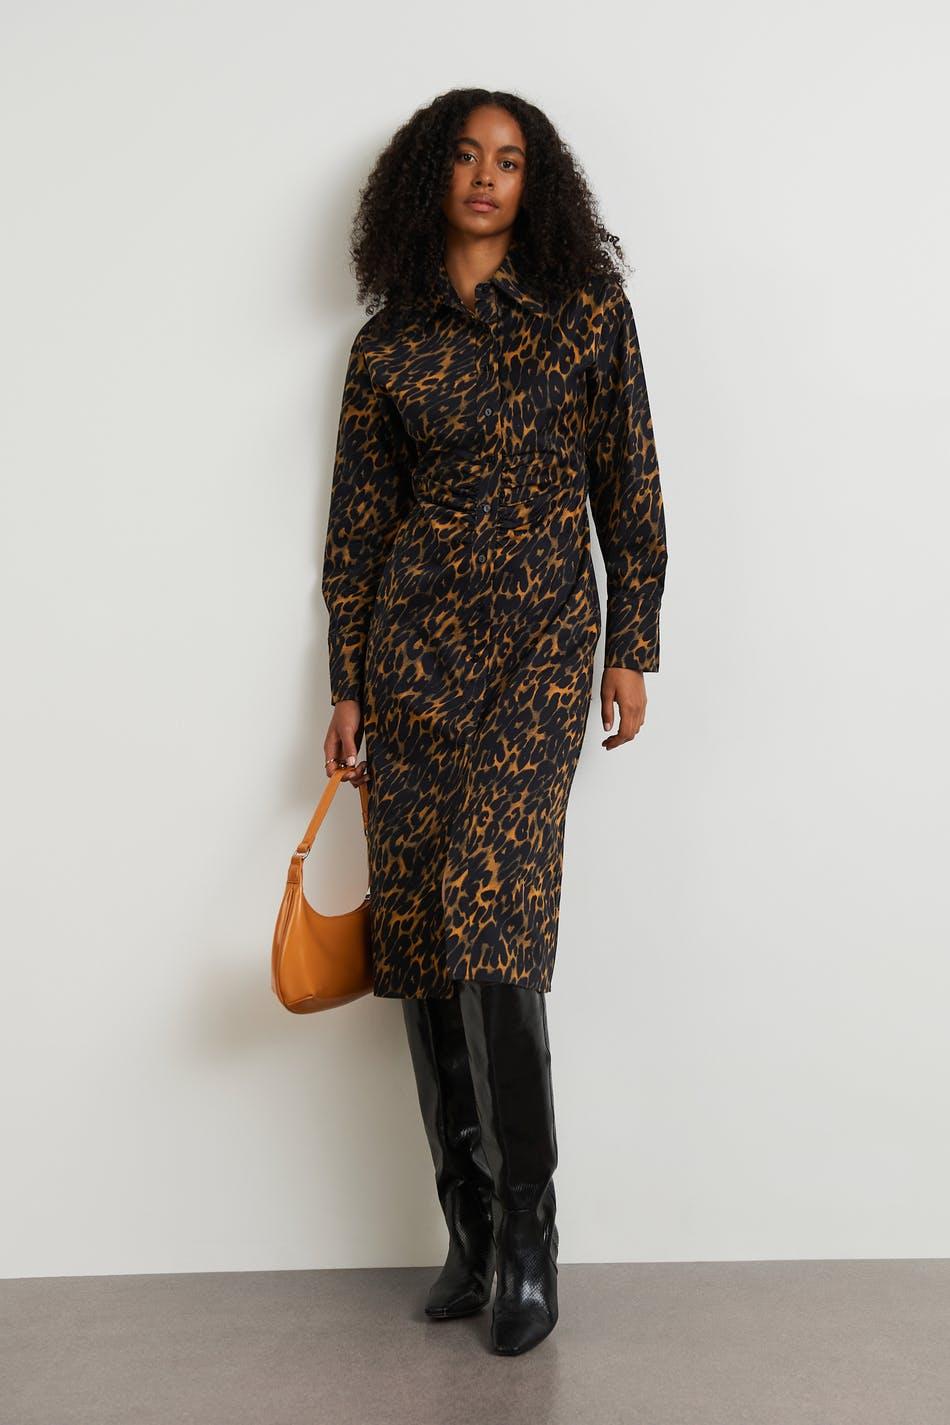 Gina Tricot Fiona shirt dress